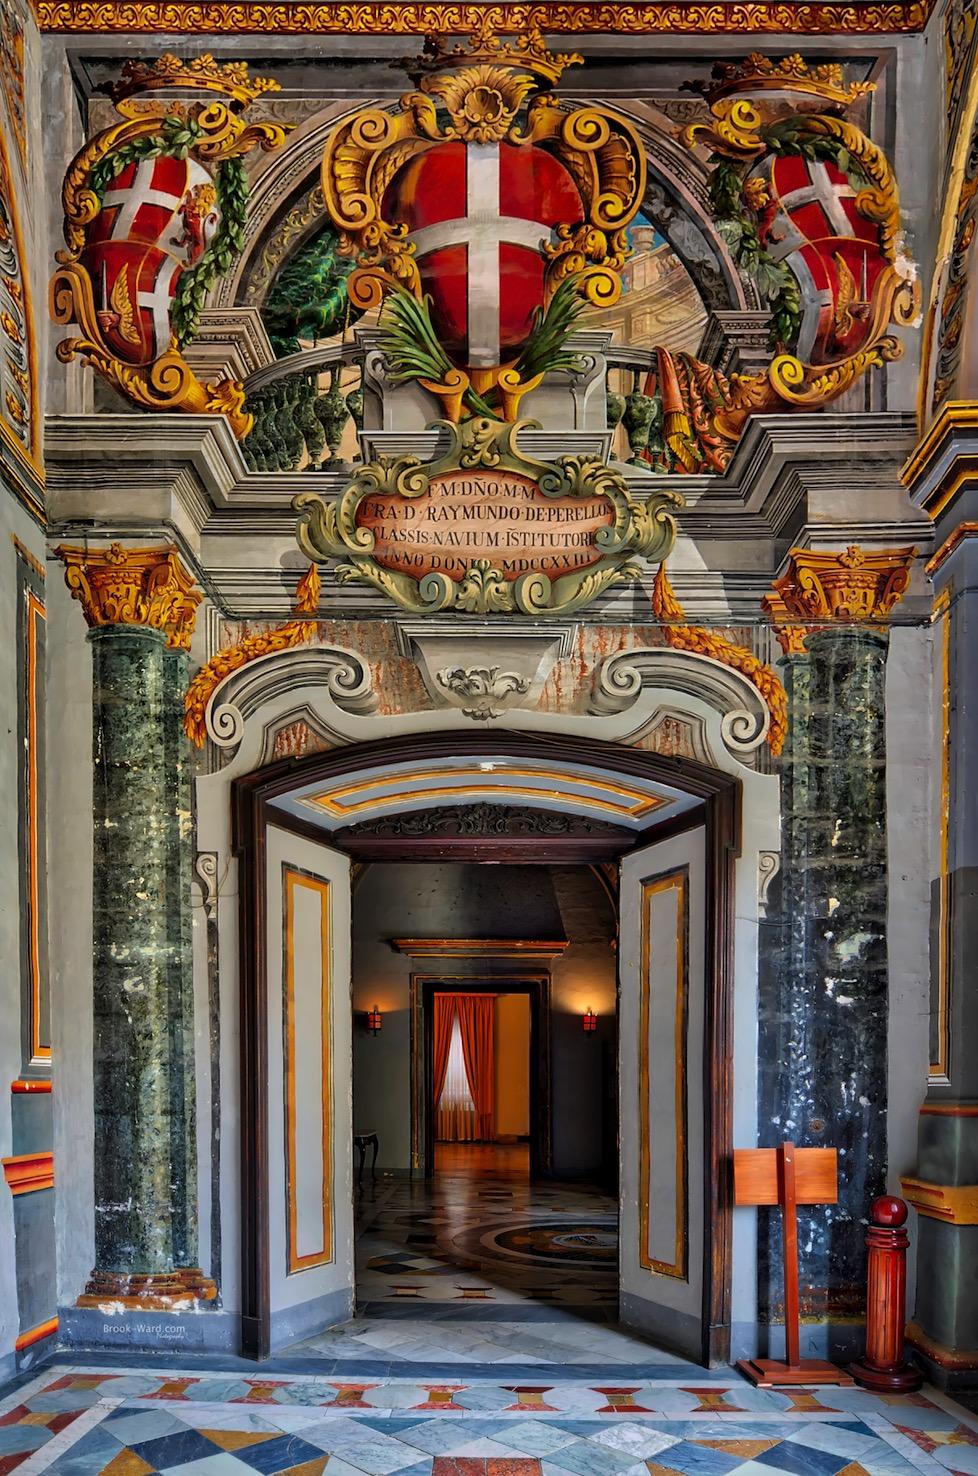 Palace of the Grandmaster